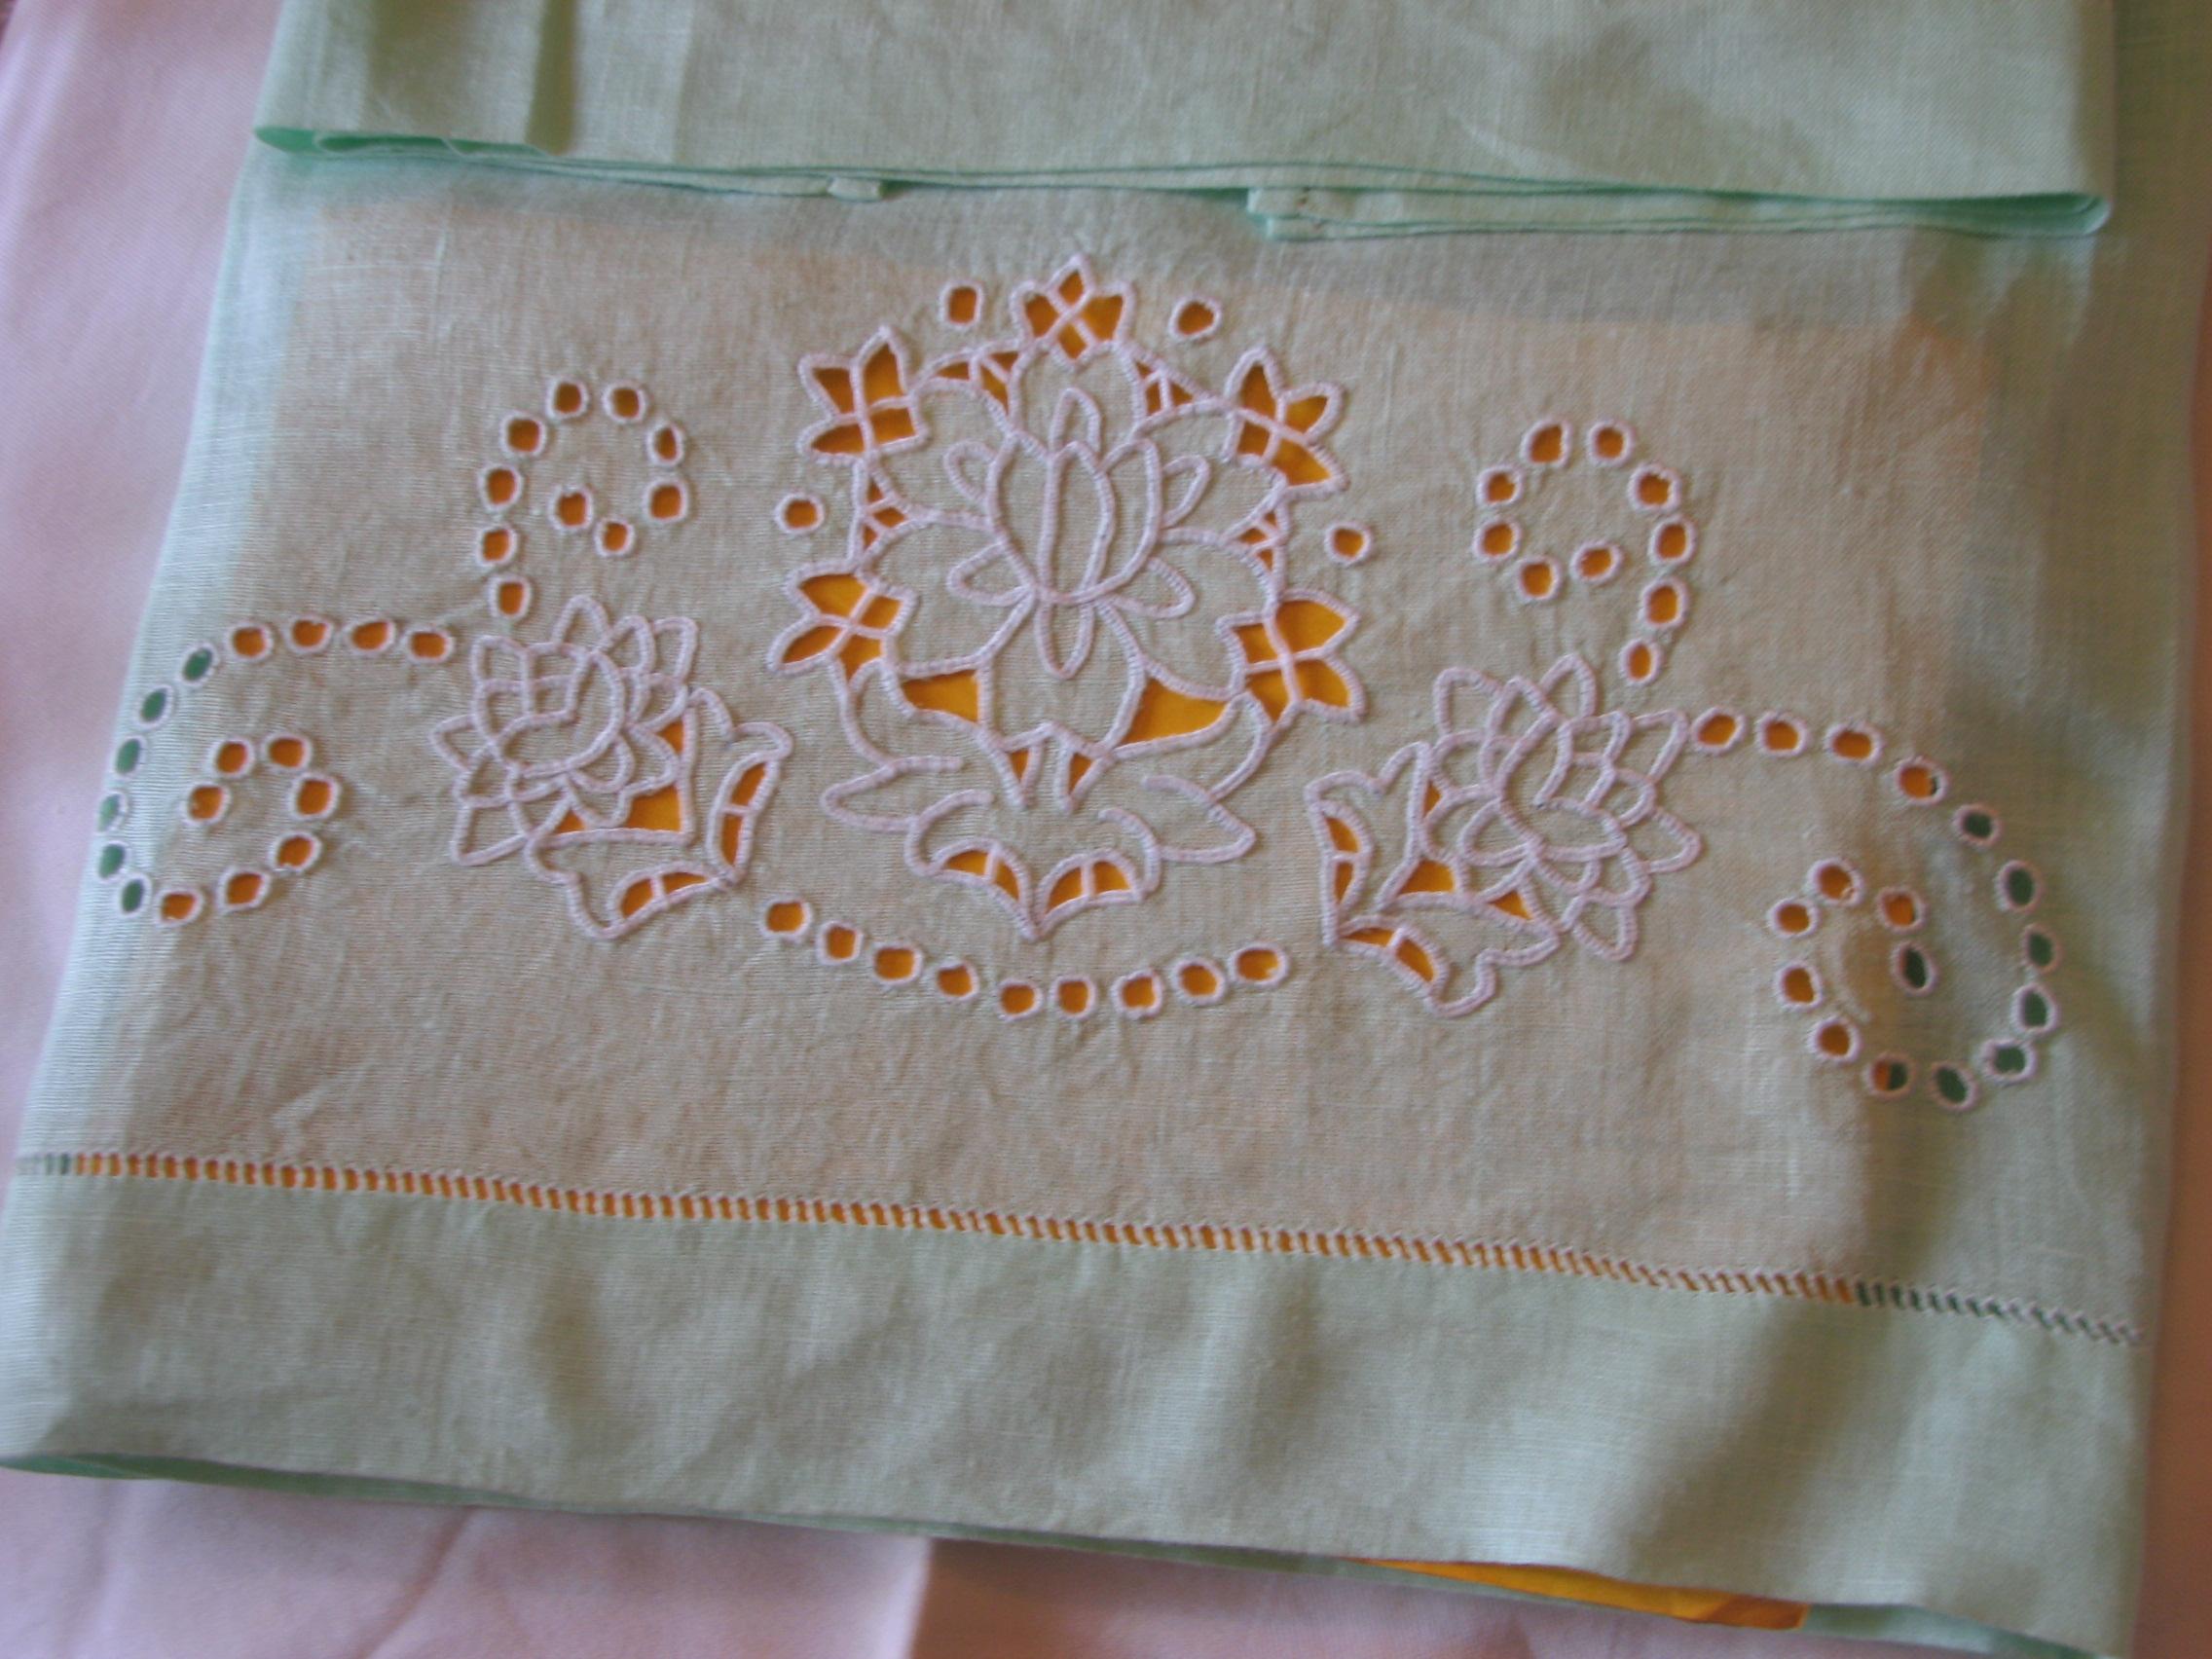 Ricamo italiano italian embroidery guest post by maria for Ricamo a macchina